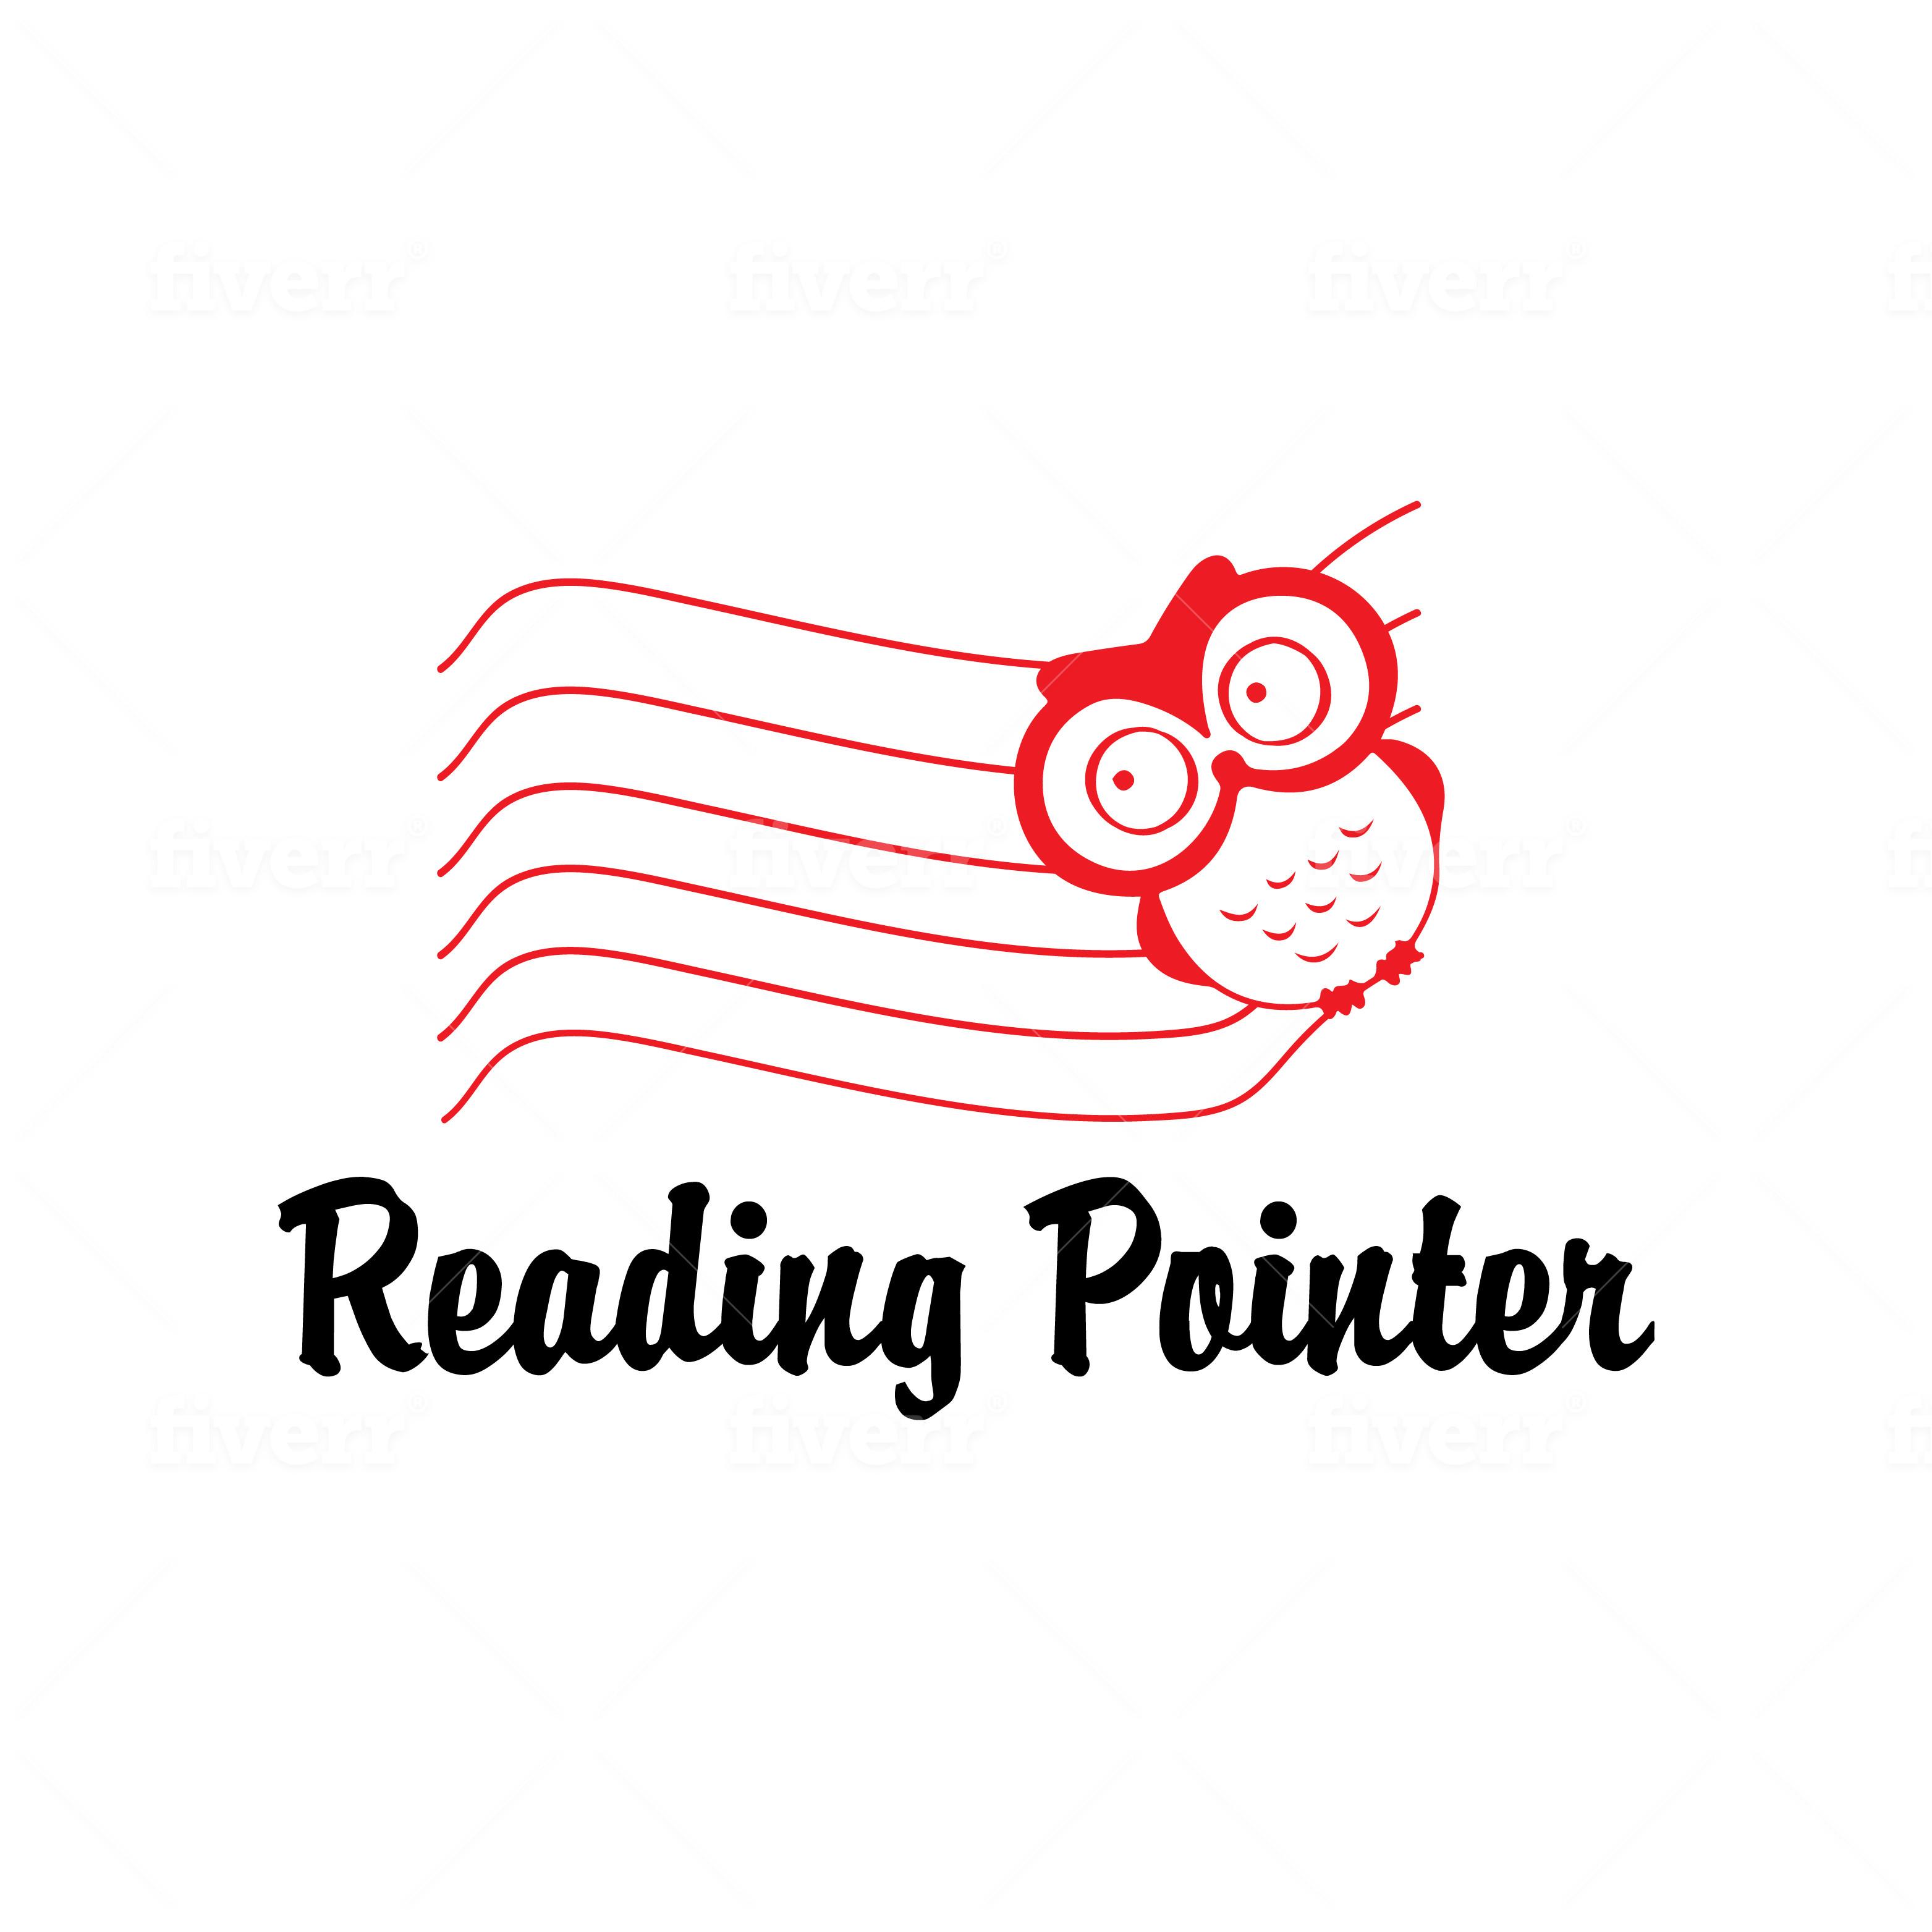 pointer-logo-fiverr-1.jpg